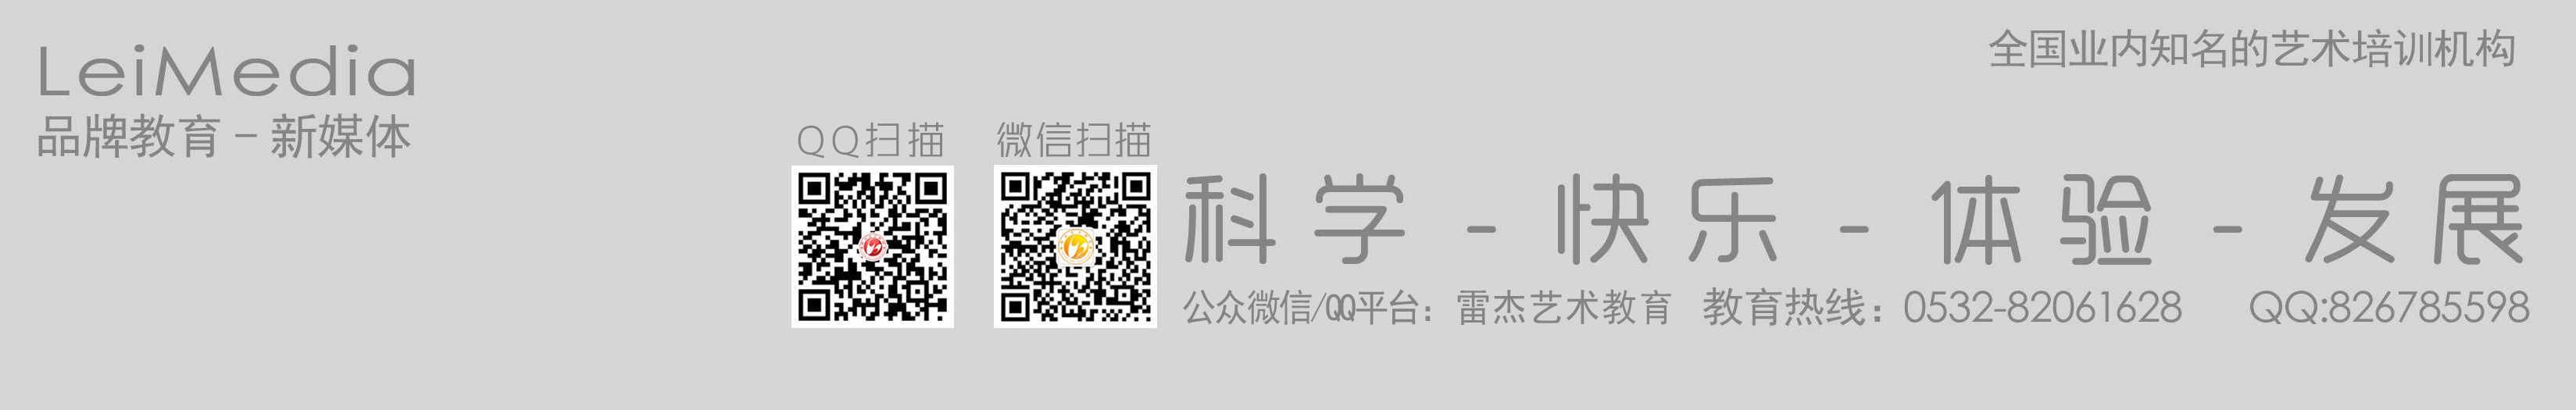 雷杰艺术教育 banner